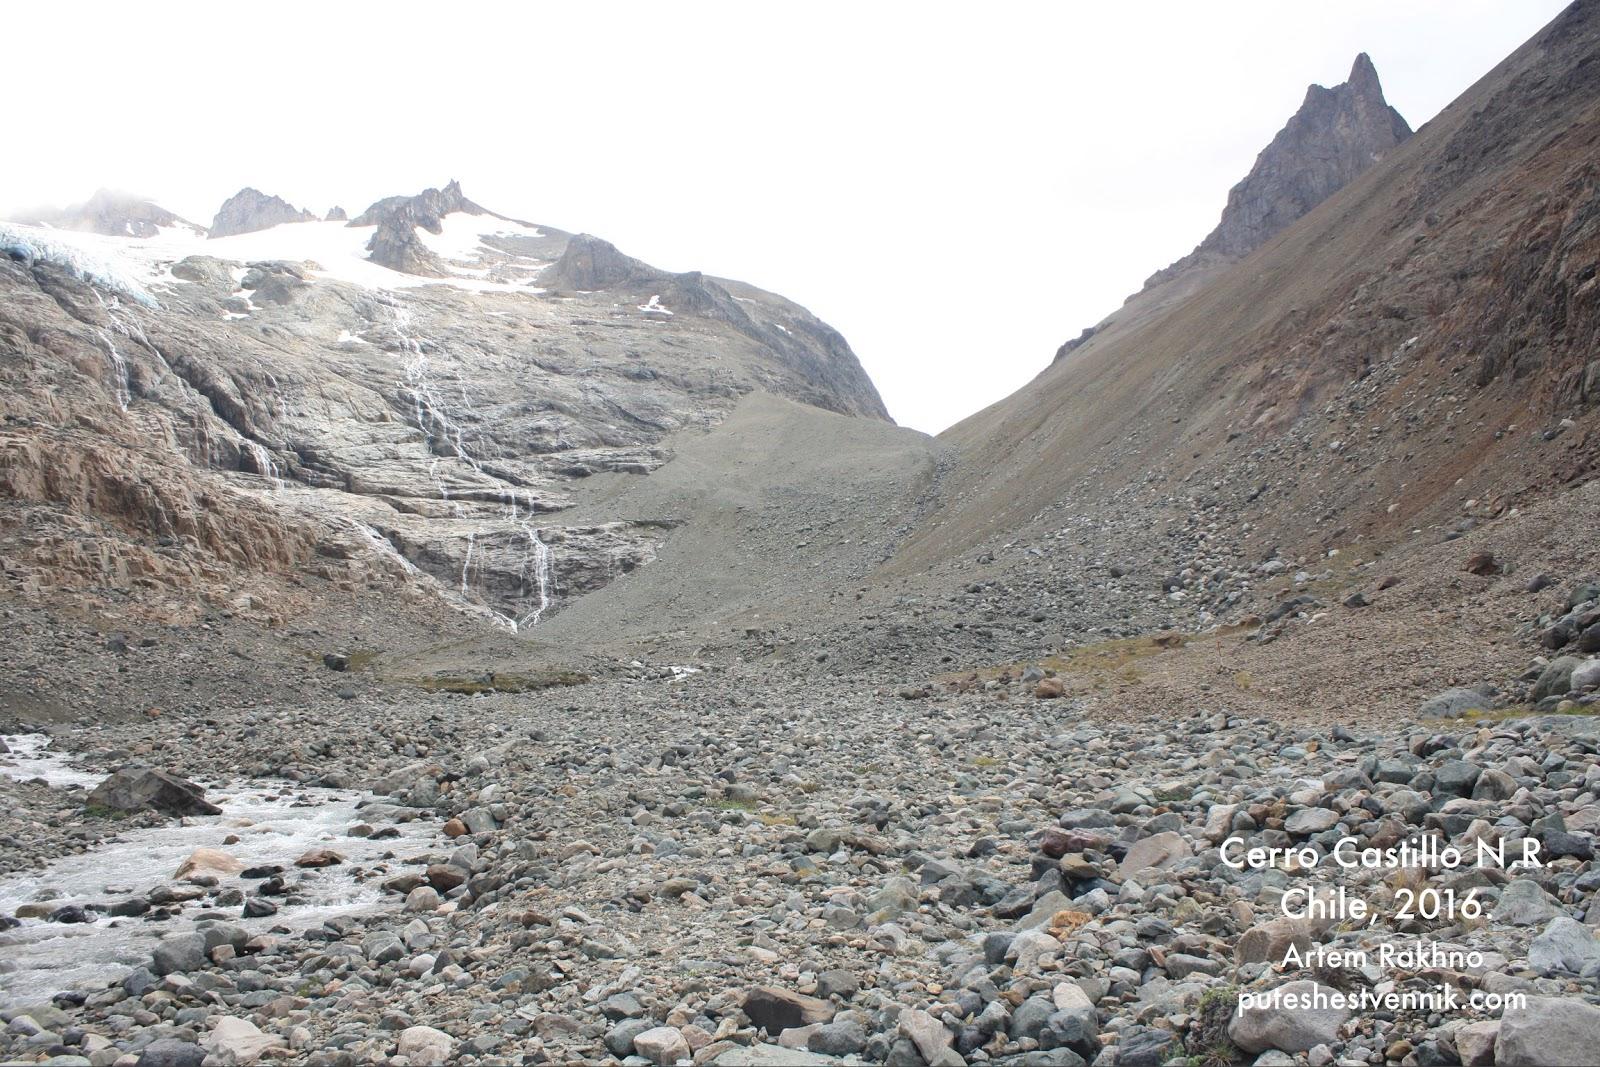 Вид на перевал со стороны